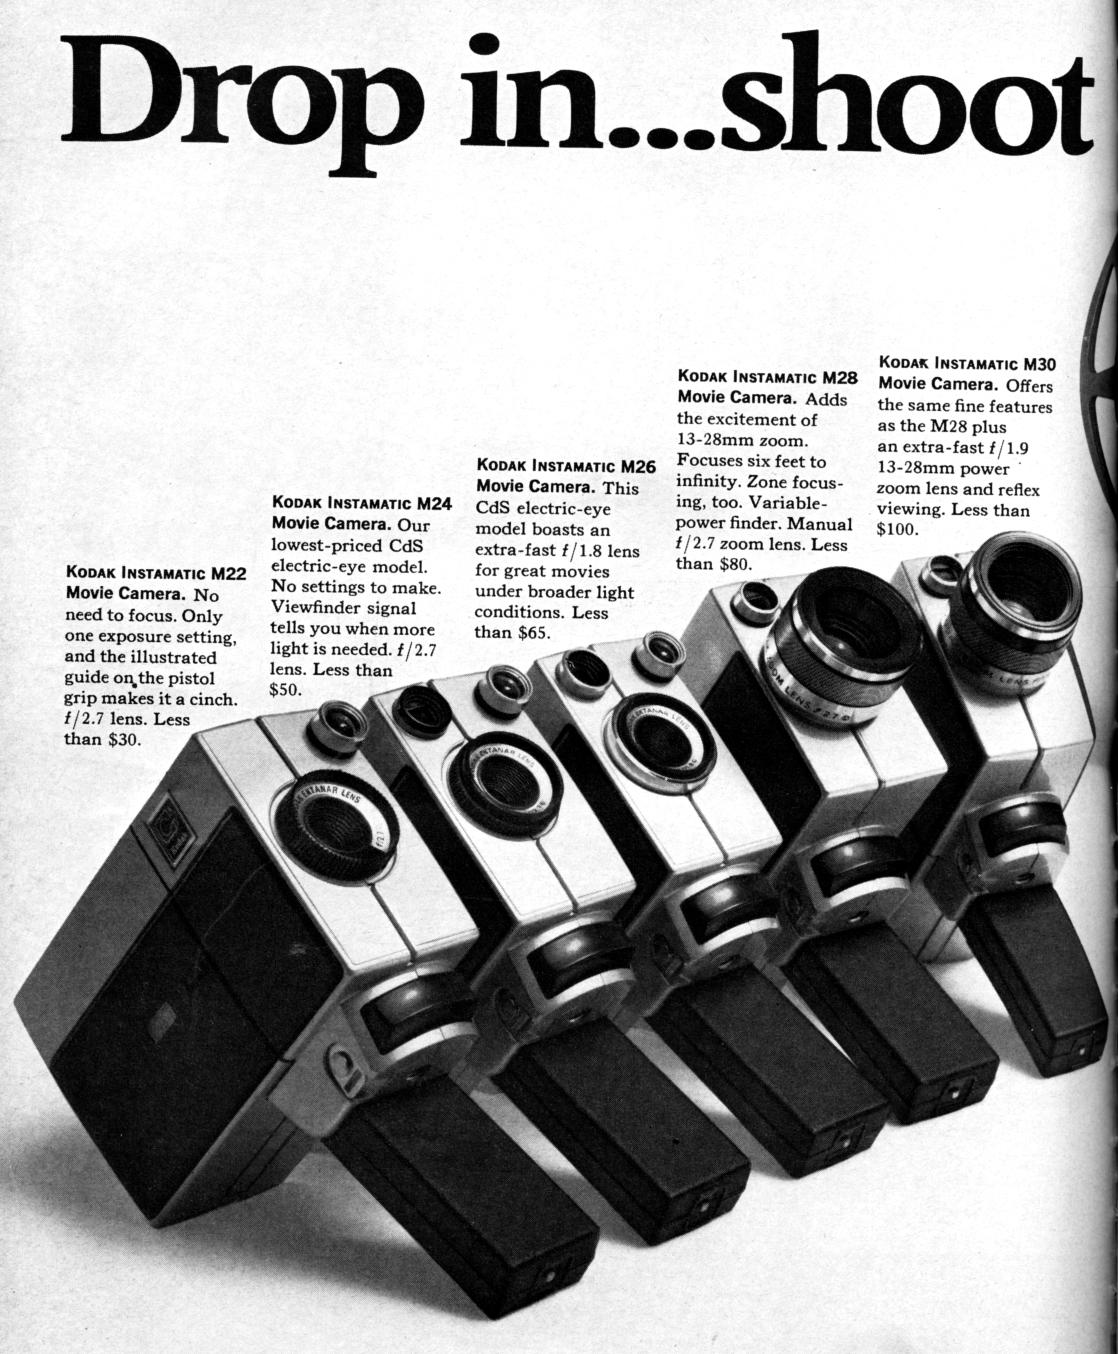 kenmore progressive canister vacuum owners manual